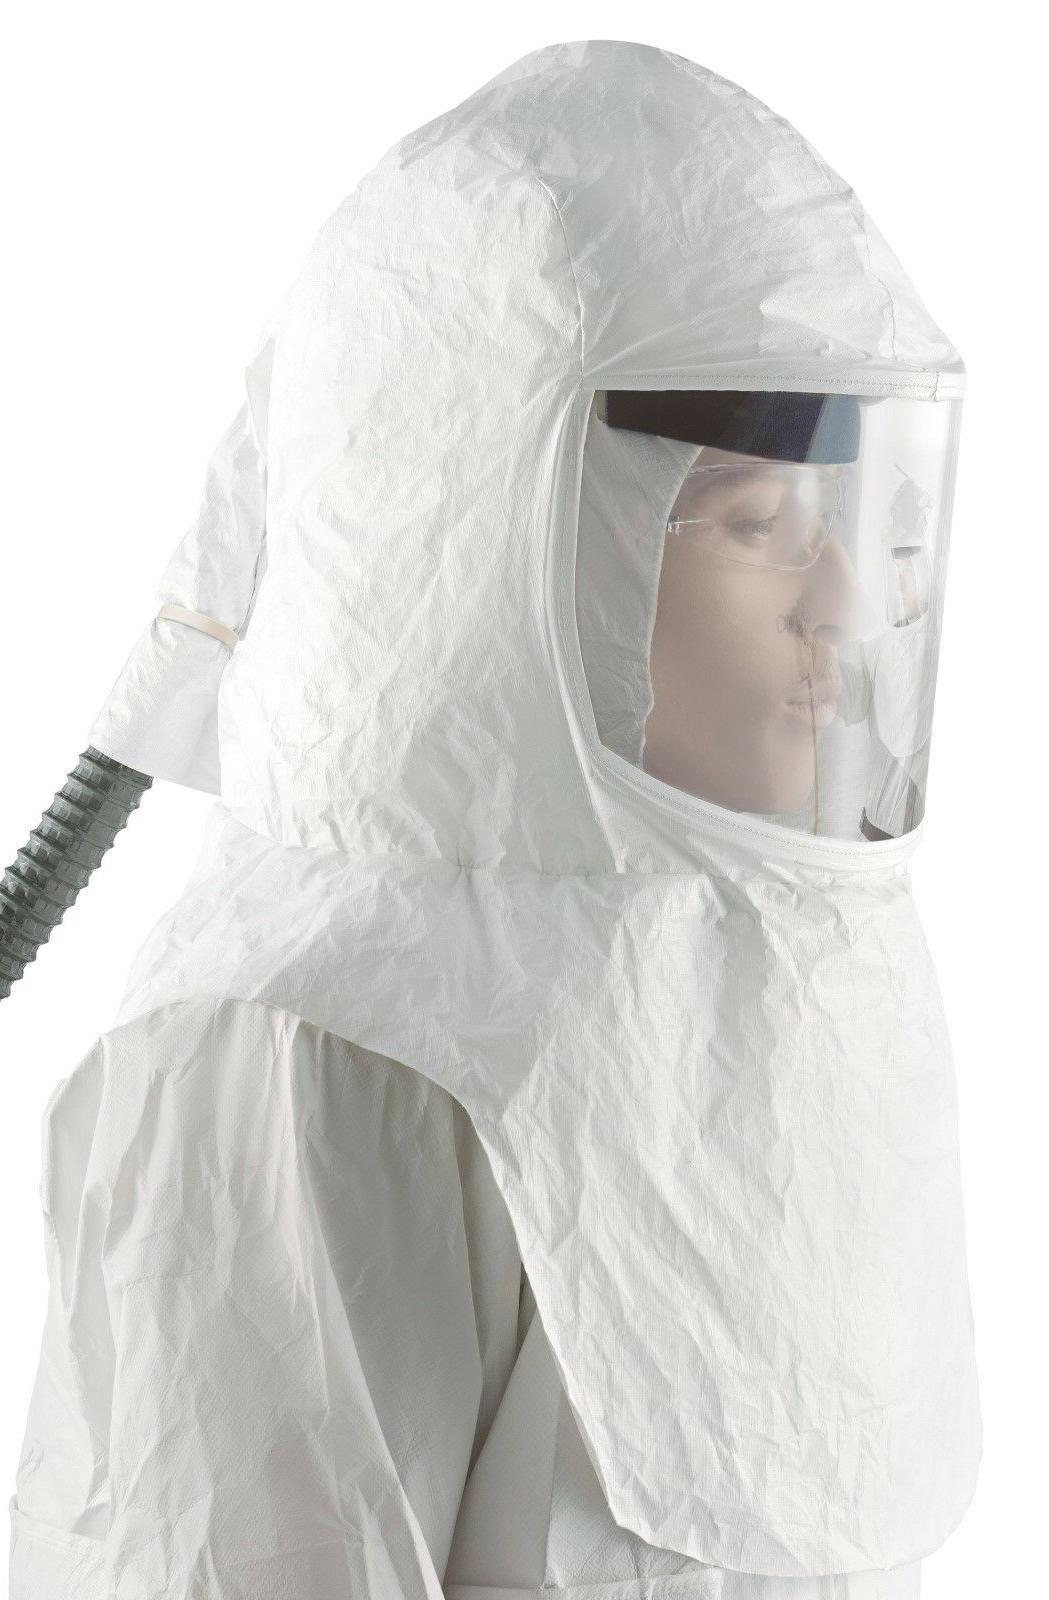 Lightweight Respirator Painting, applications